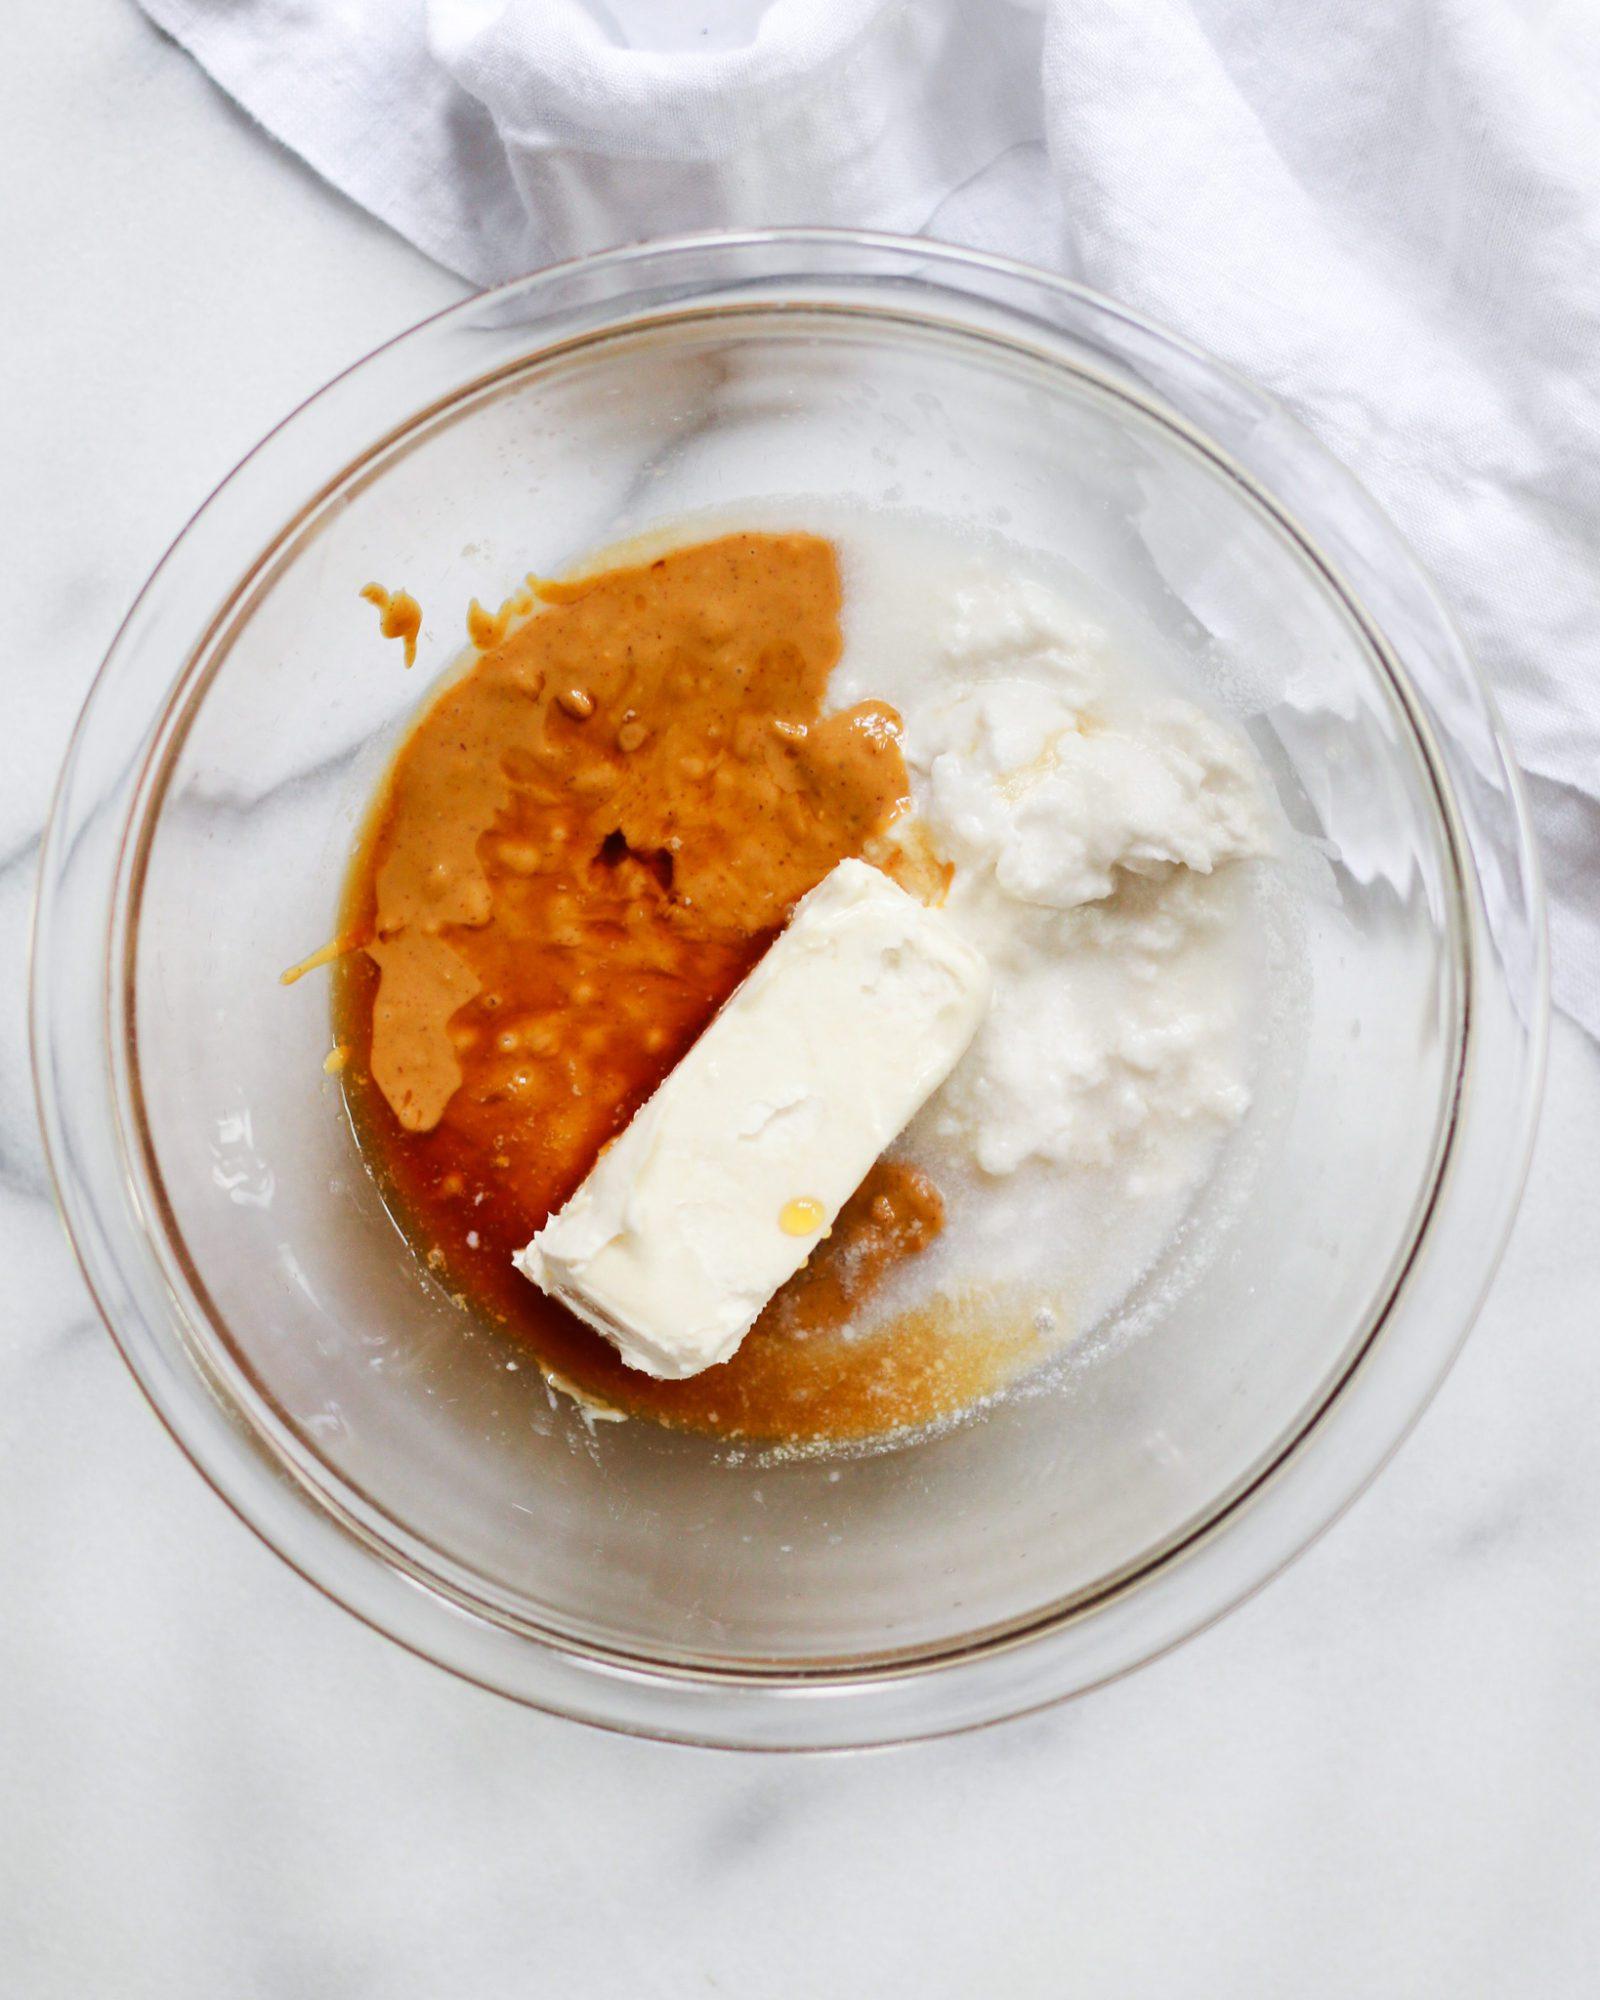 peanut butter swirl ingredients in white bowl